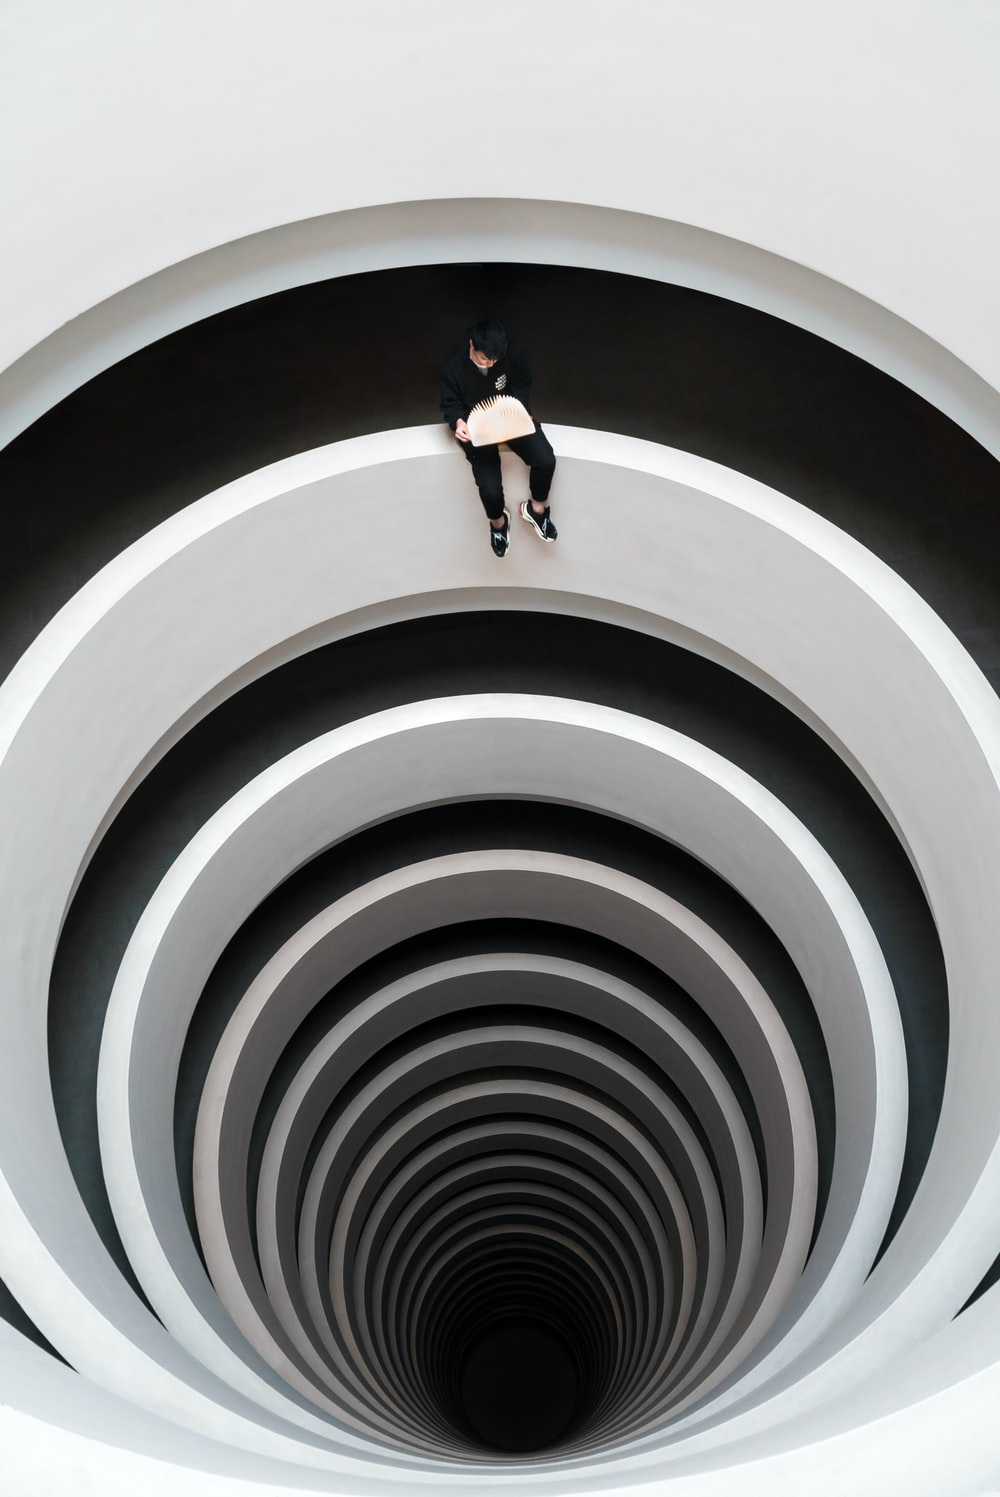 man sitting on deep pit design